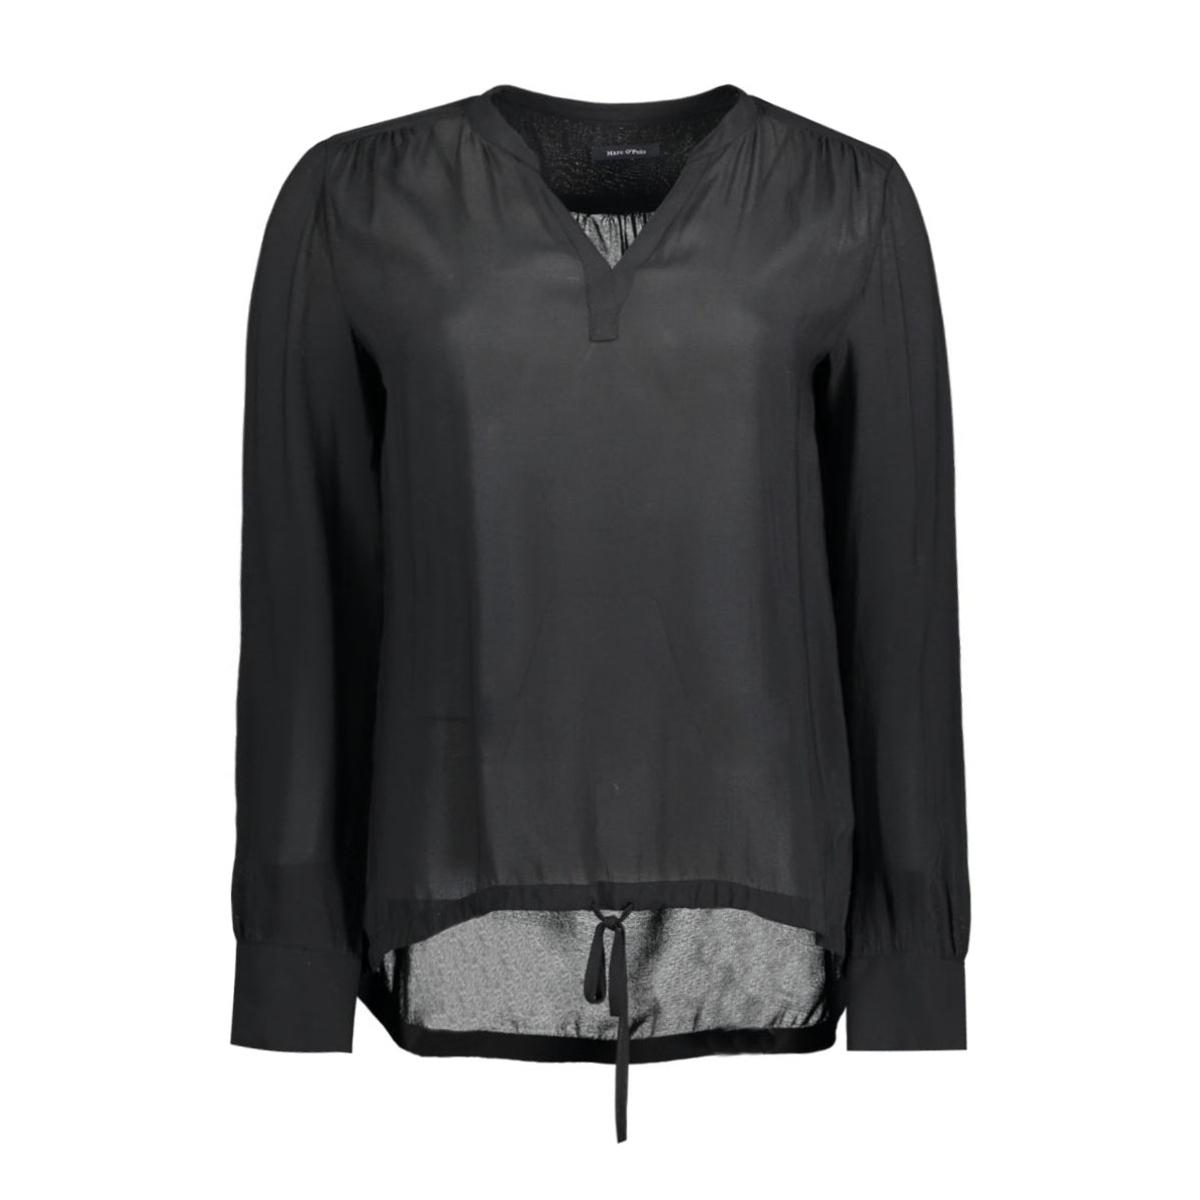 609 1275 42723 marc o`polo blouse 990 black